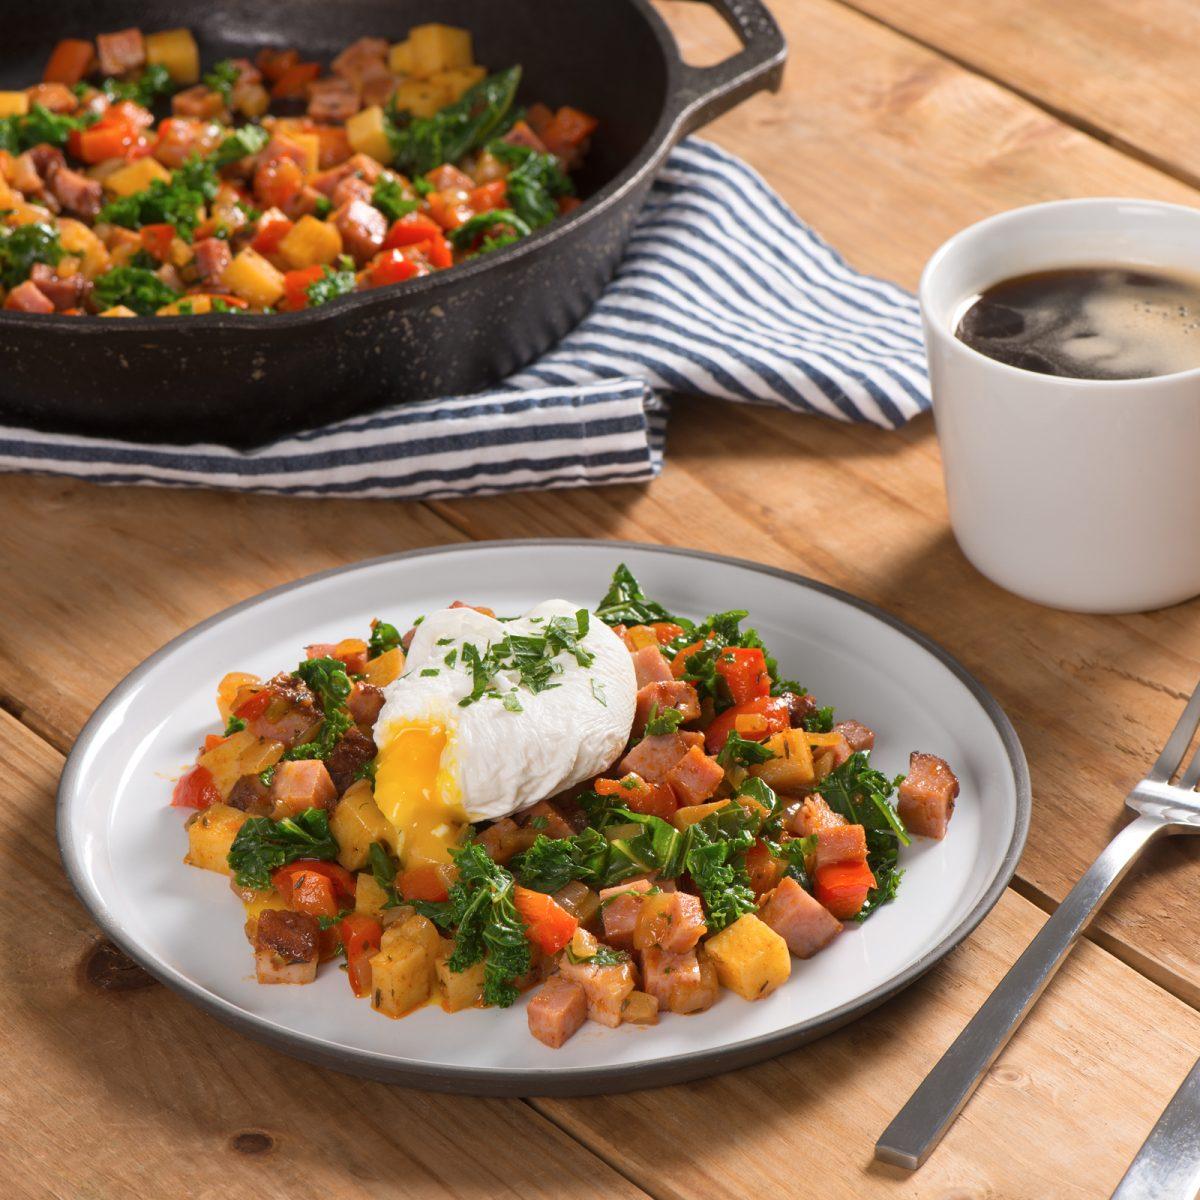 Breakfast Hash with Ham Potatoes and Kale